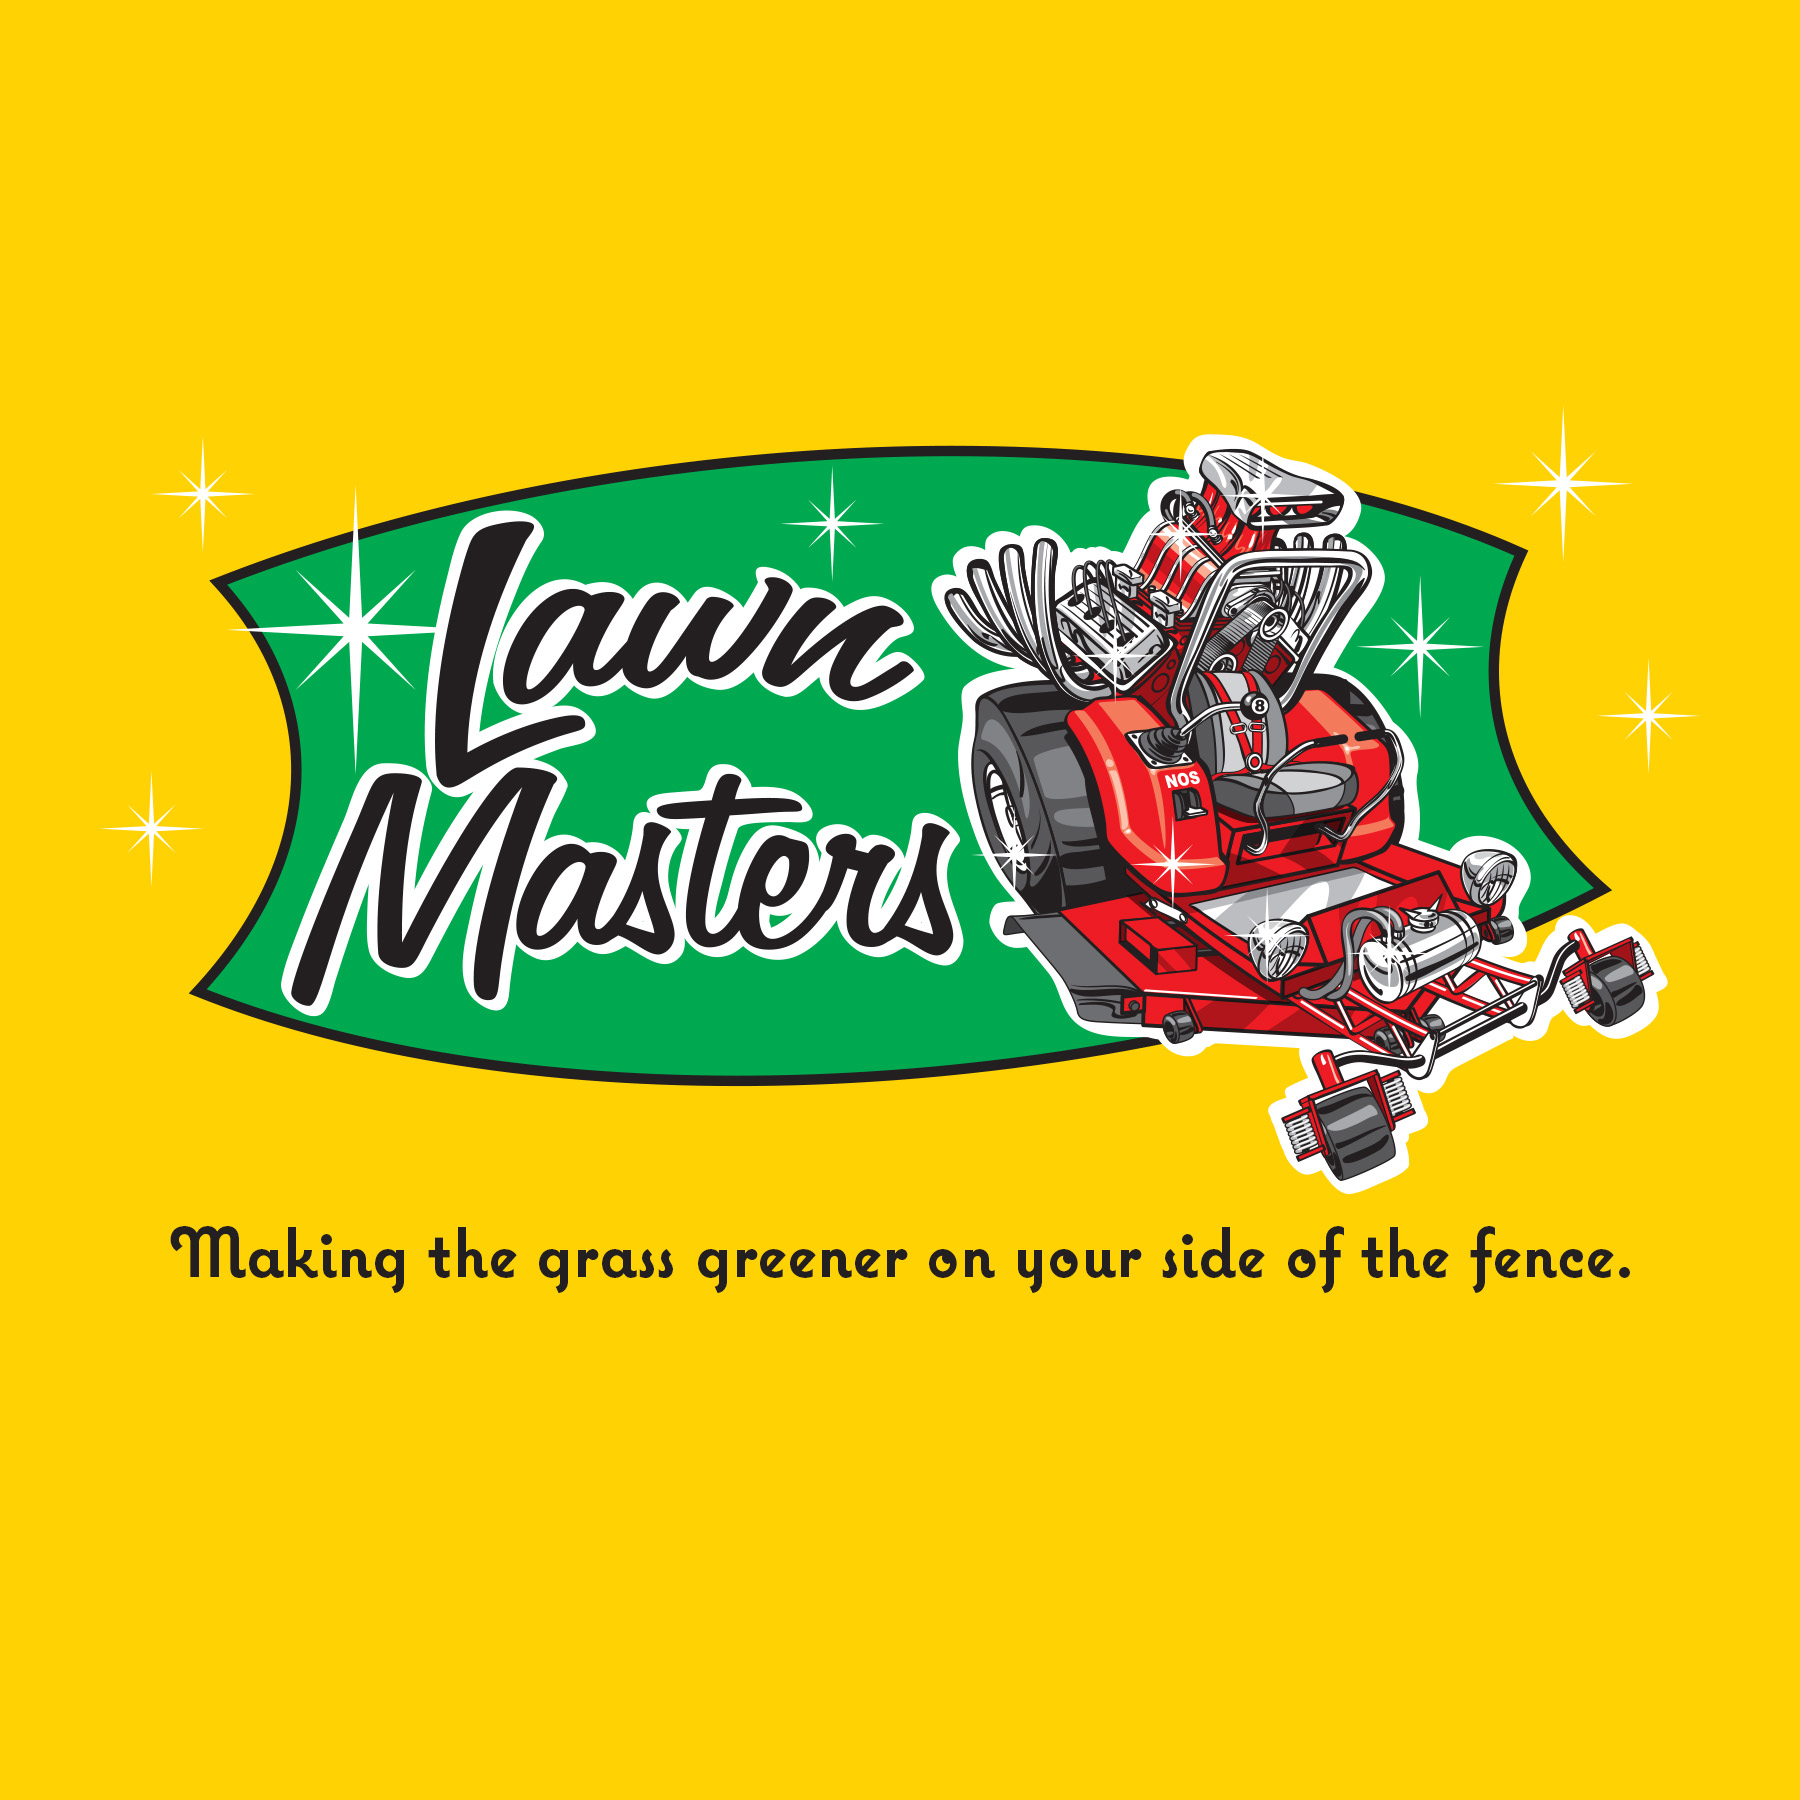 Lawn Masters.jpg